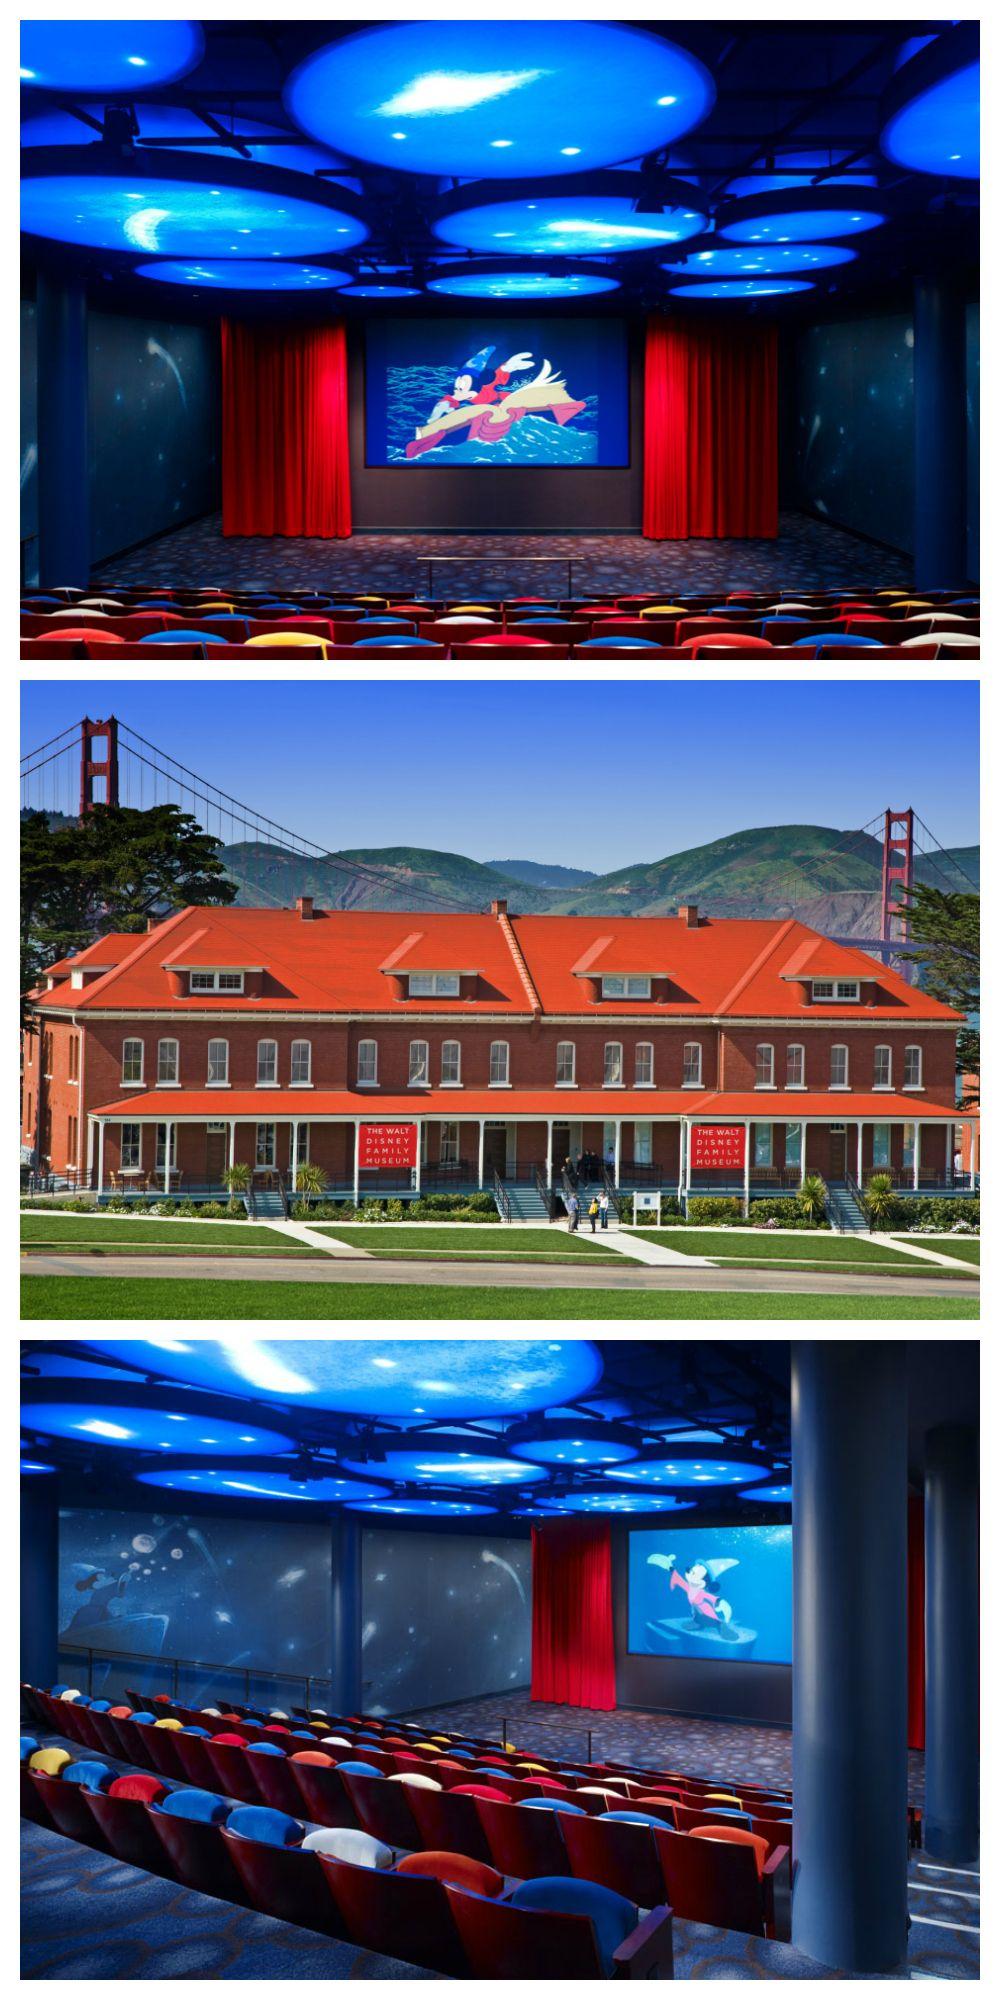 Located In The Presidio Of San Francisco The Walt Disney Family